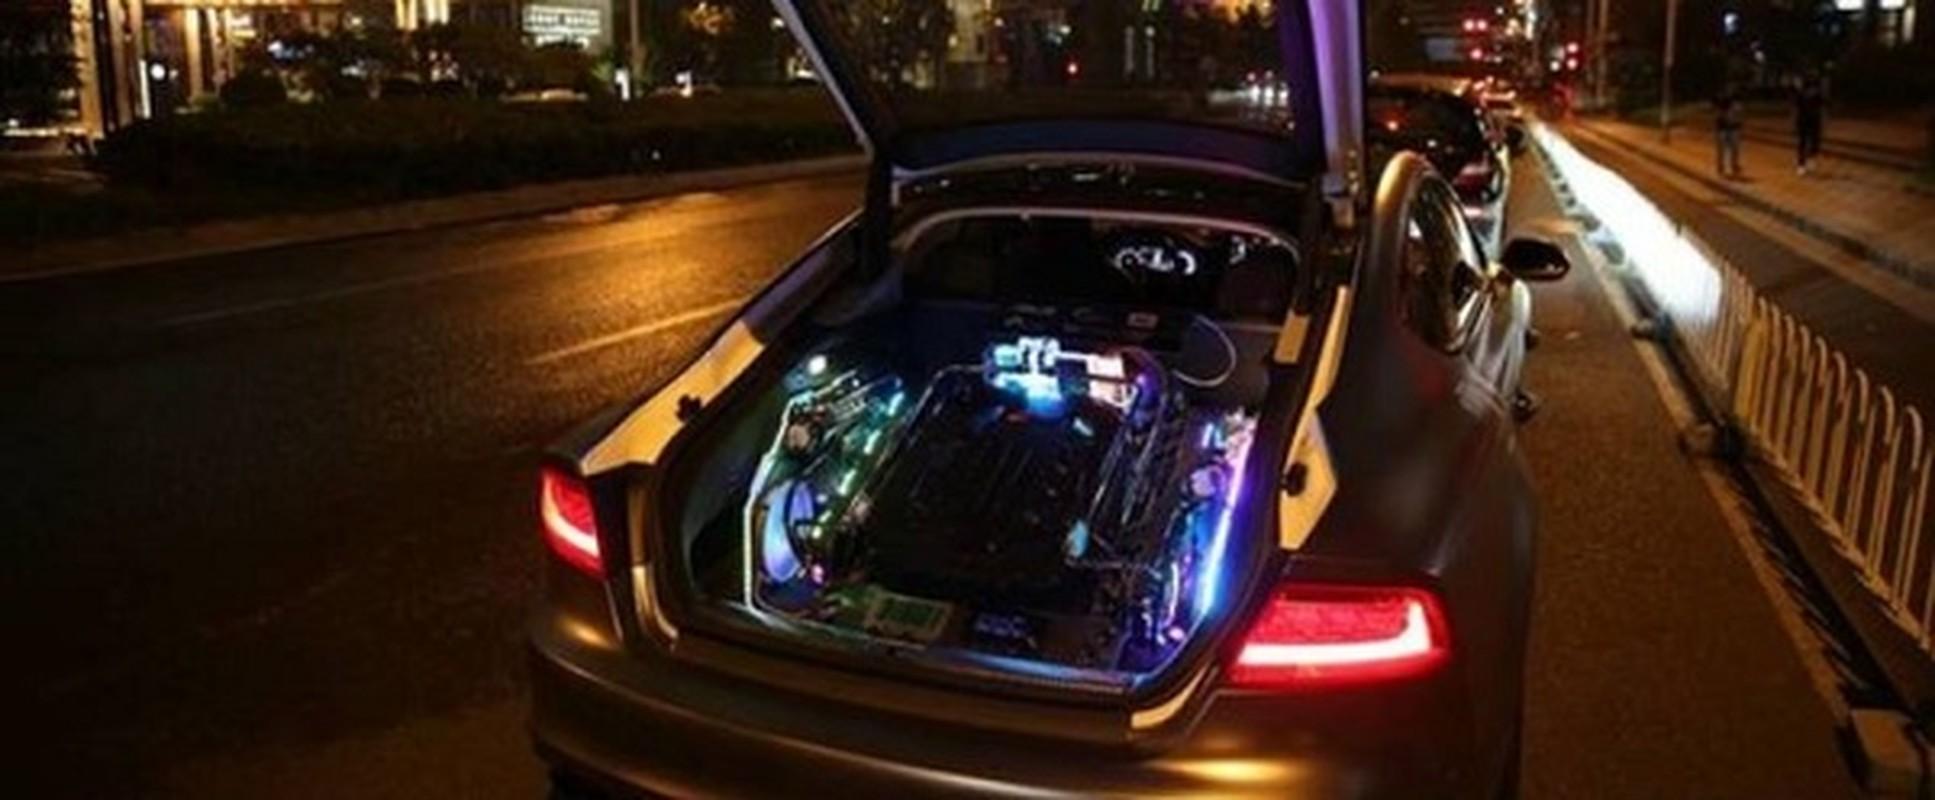 Dan choi chi 4,2 ty do Audi S7 thanh gaming PC sieu khung-Hinh-7